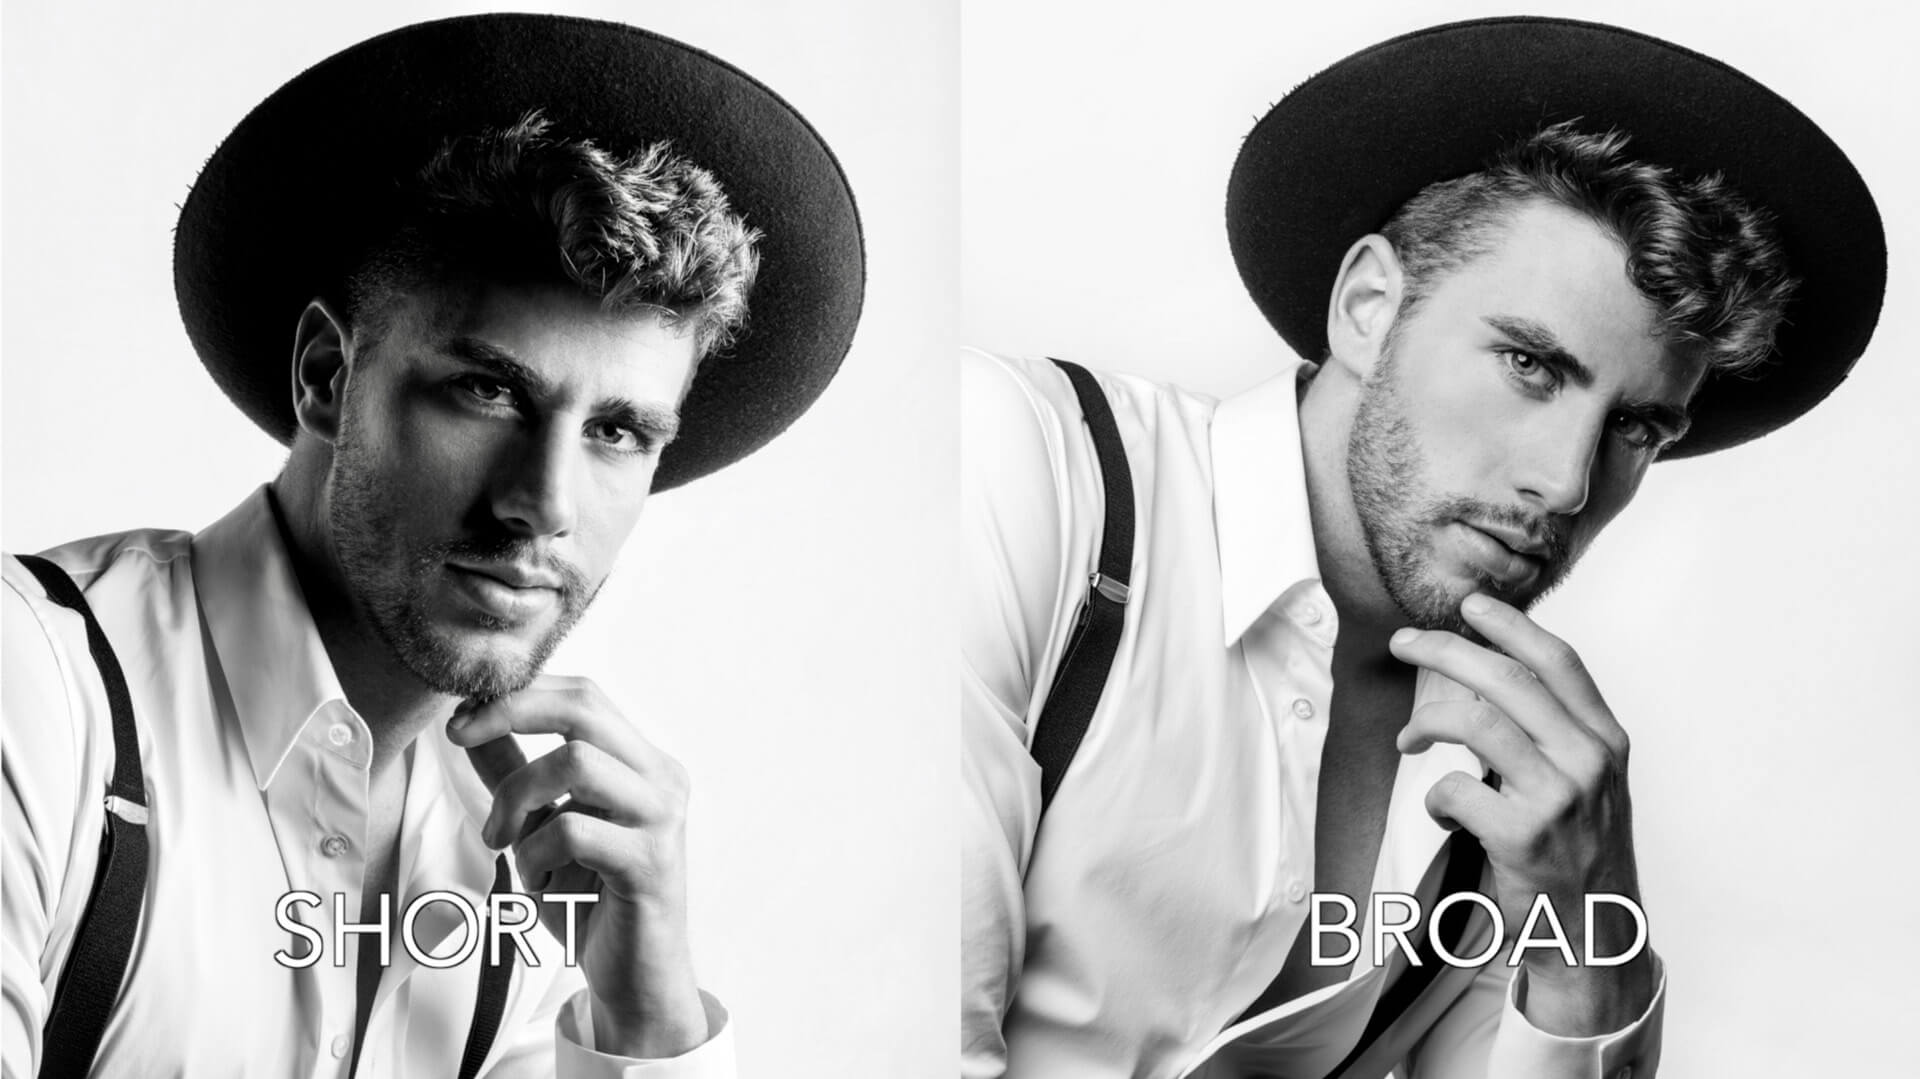 Broad vs Short lighting — Photography shot lists